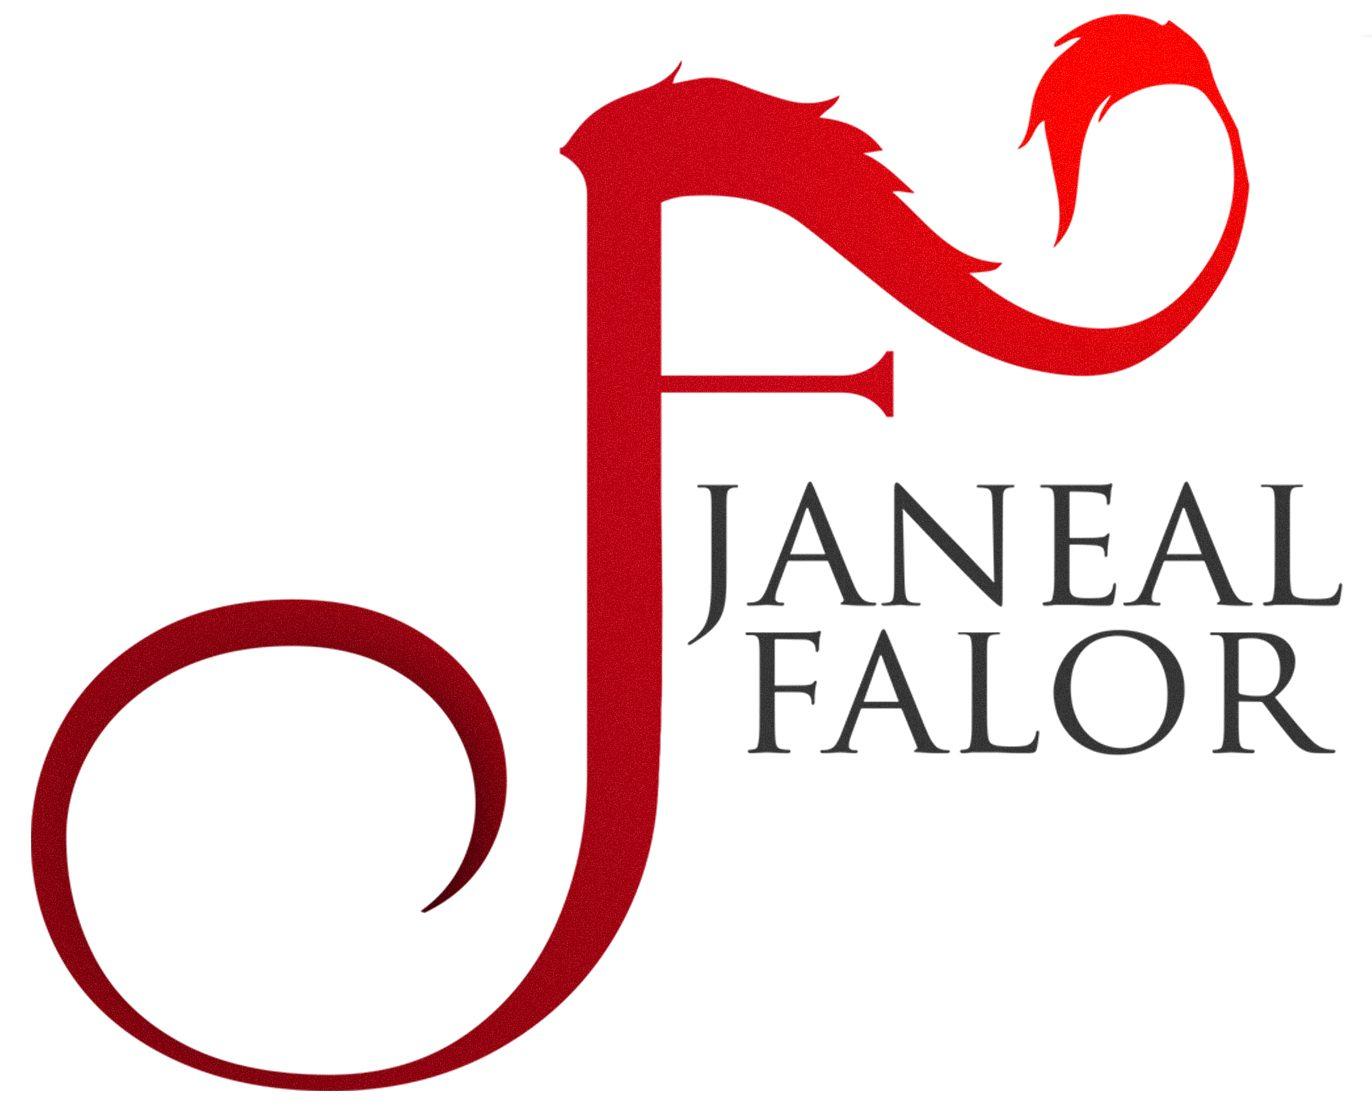 Janeal Falor